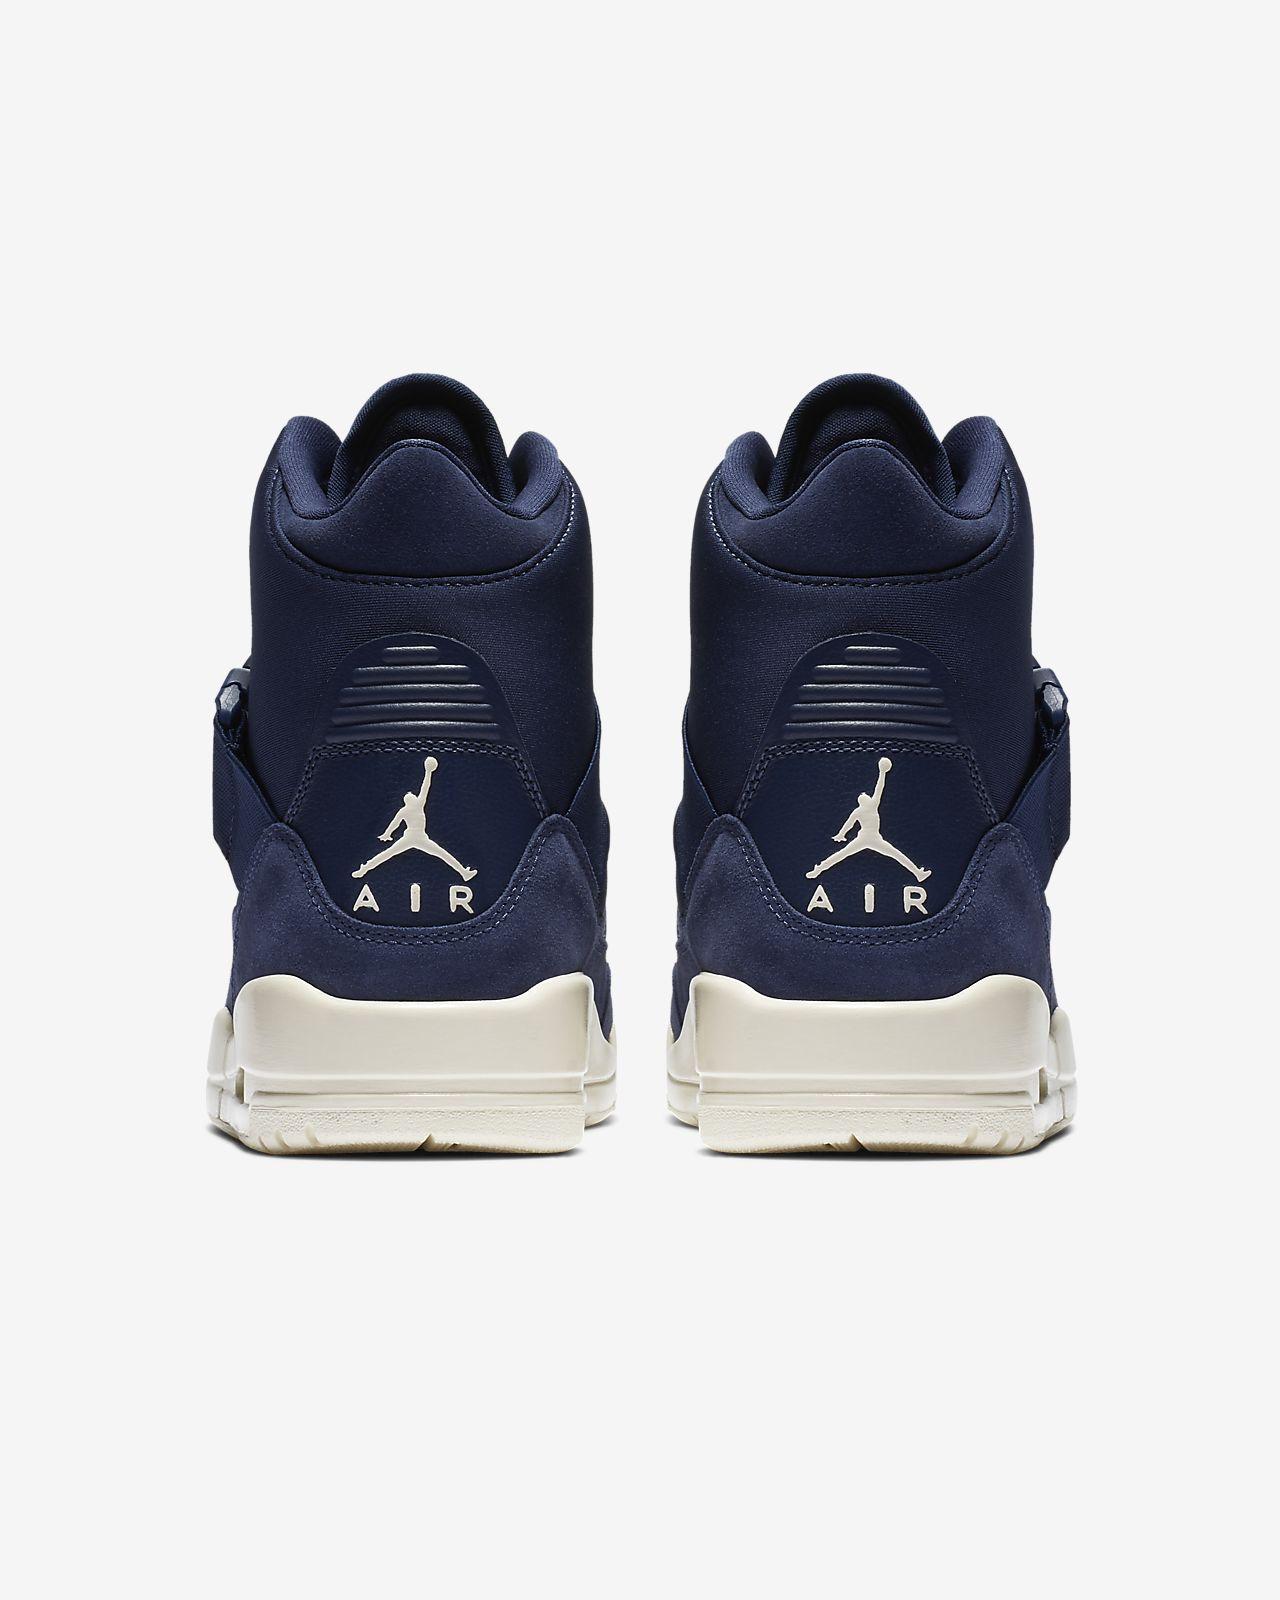 b9ddc69eedd072 Air Jordan 3 Retro Explorer XX Women s Shoe. Nike.com ZA